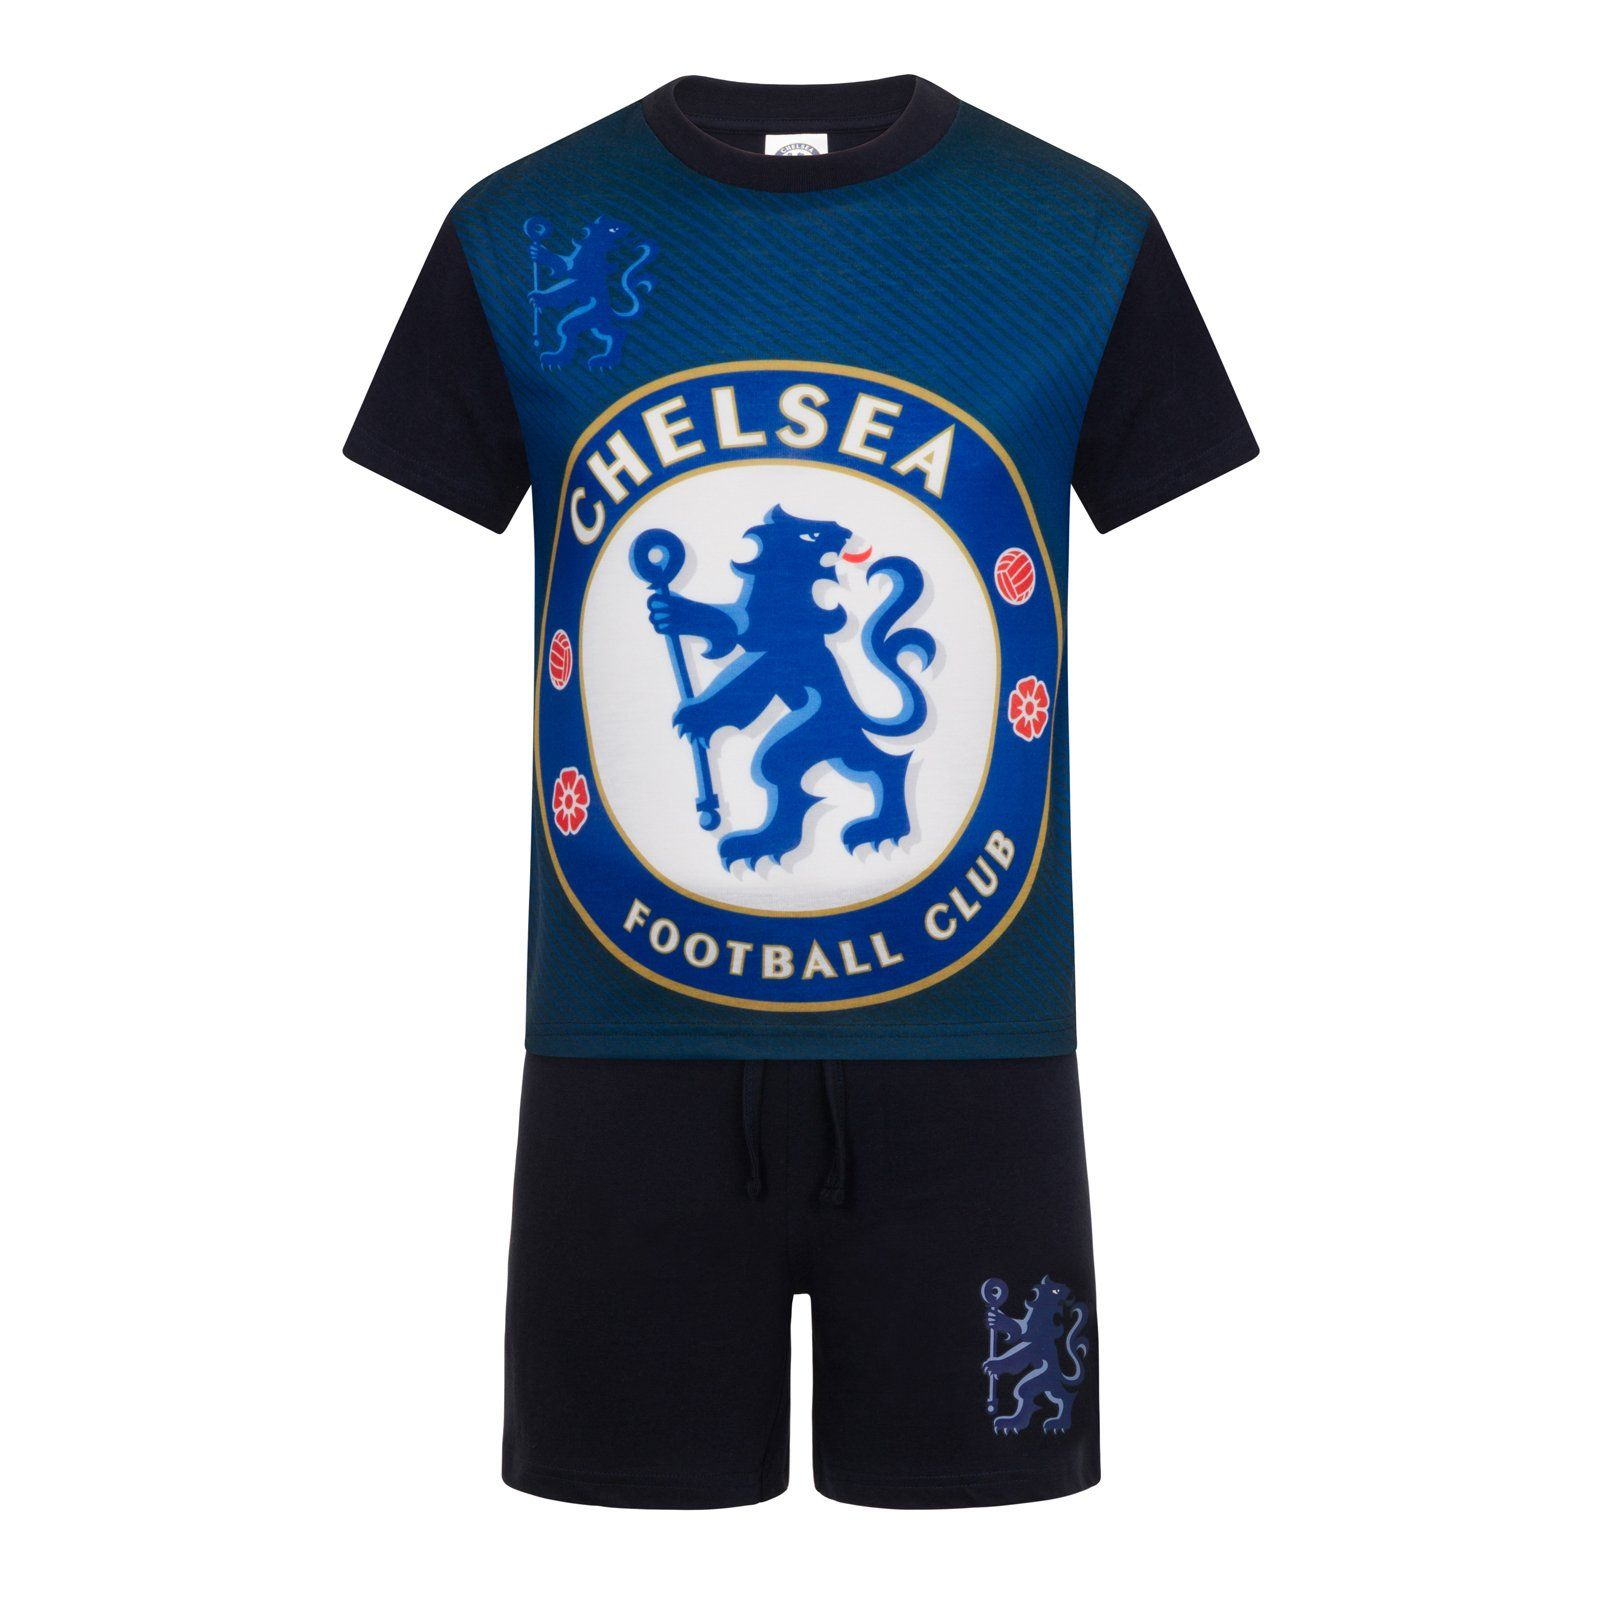 Boys Pyjamas Chelsea FC Pjs CFC Football Official Club Crest Kids 4 to 12 Years